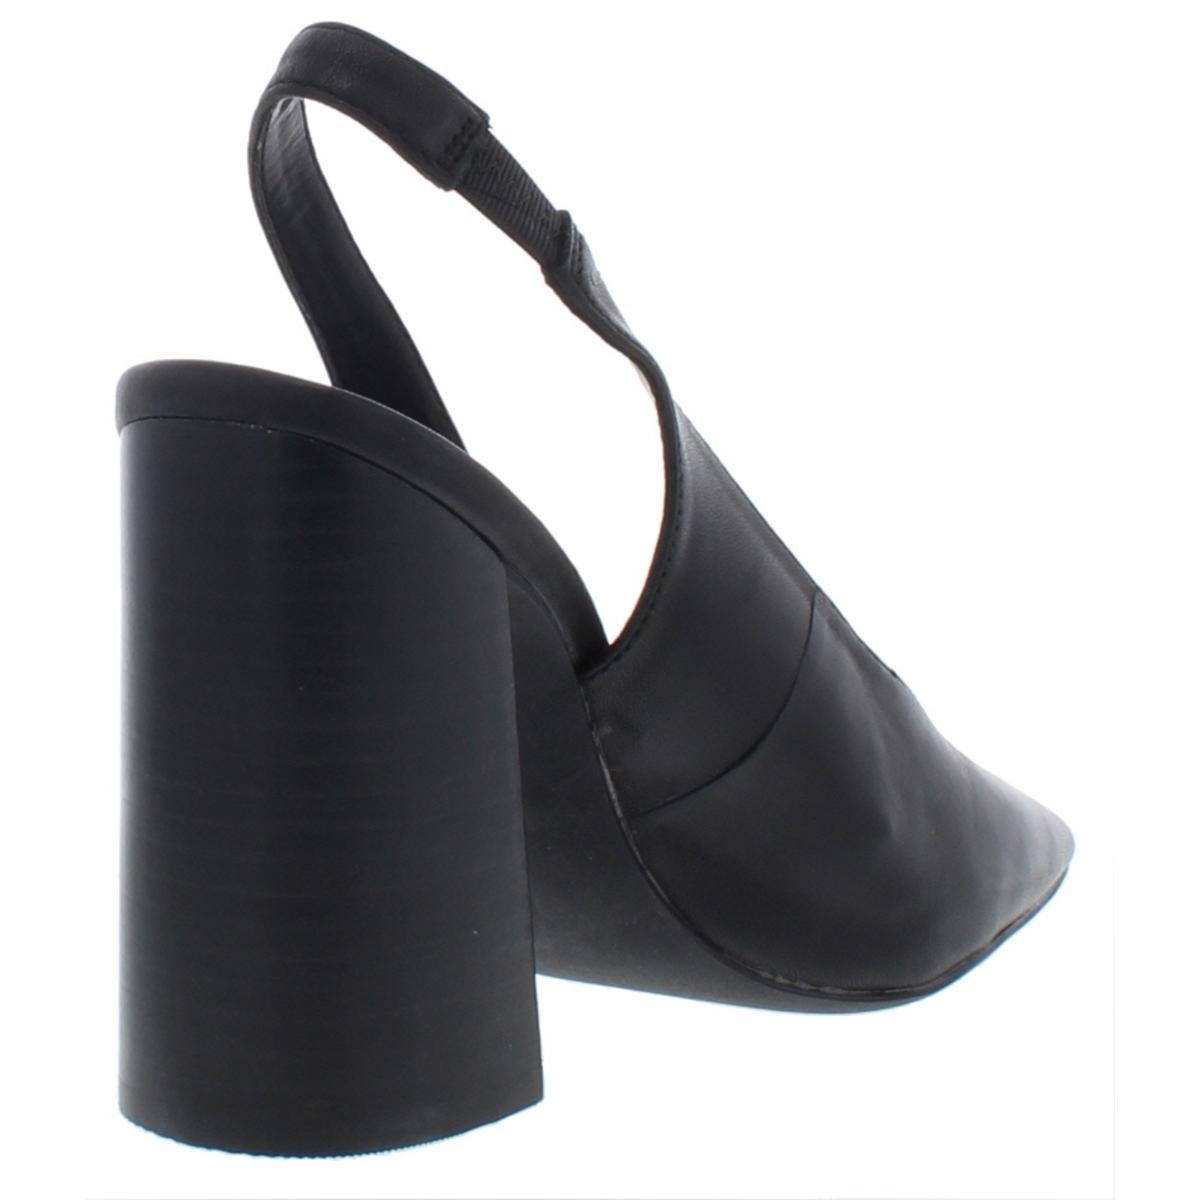 Steve-Madden-Womens-Katelin-Leather-Pointed-Toe-Slingback-Heels-Shoes-BHFO-3798 thumbnail 5